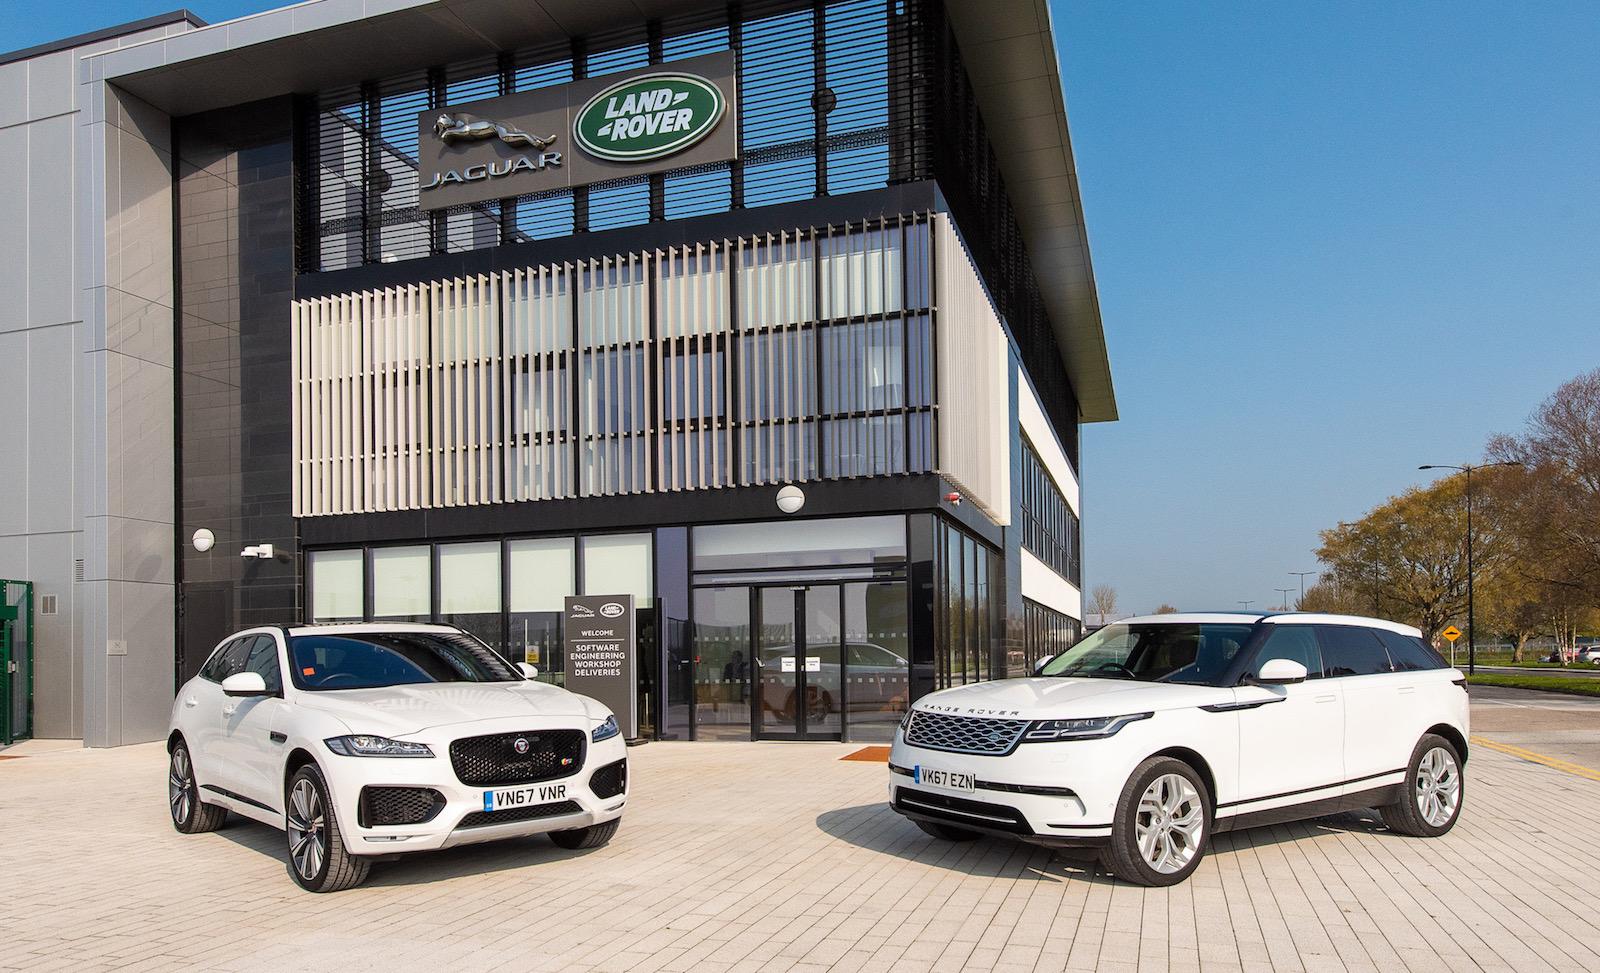 Jaguar Land Rover announces 5-year warranty in Australia